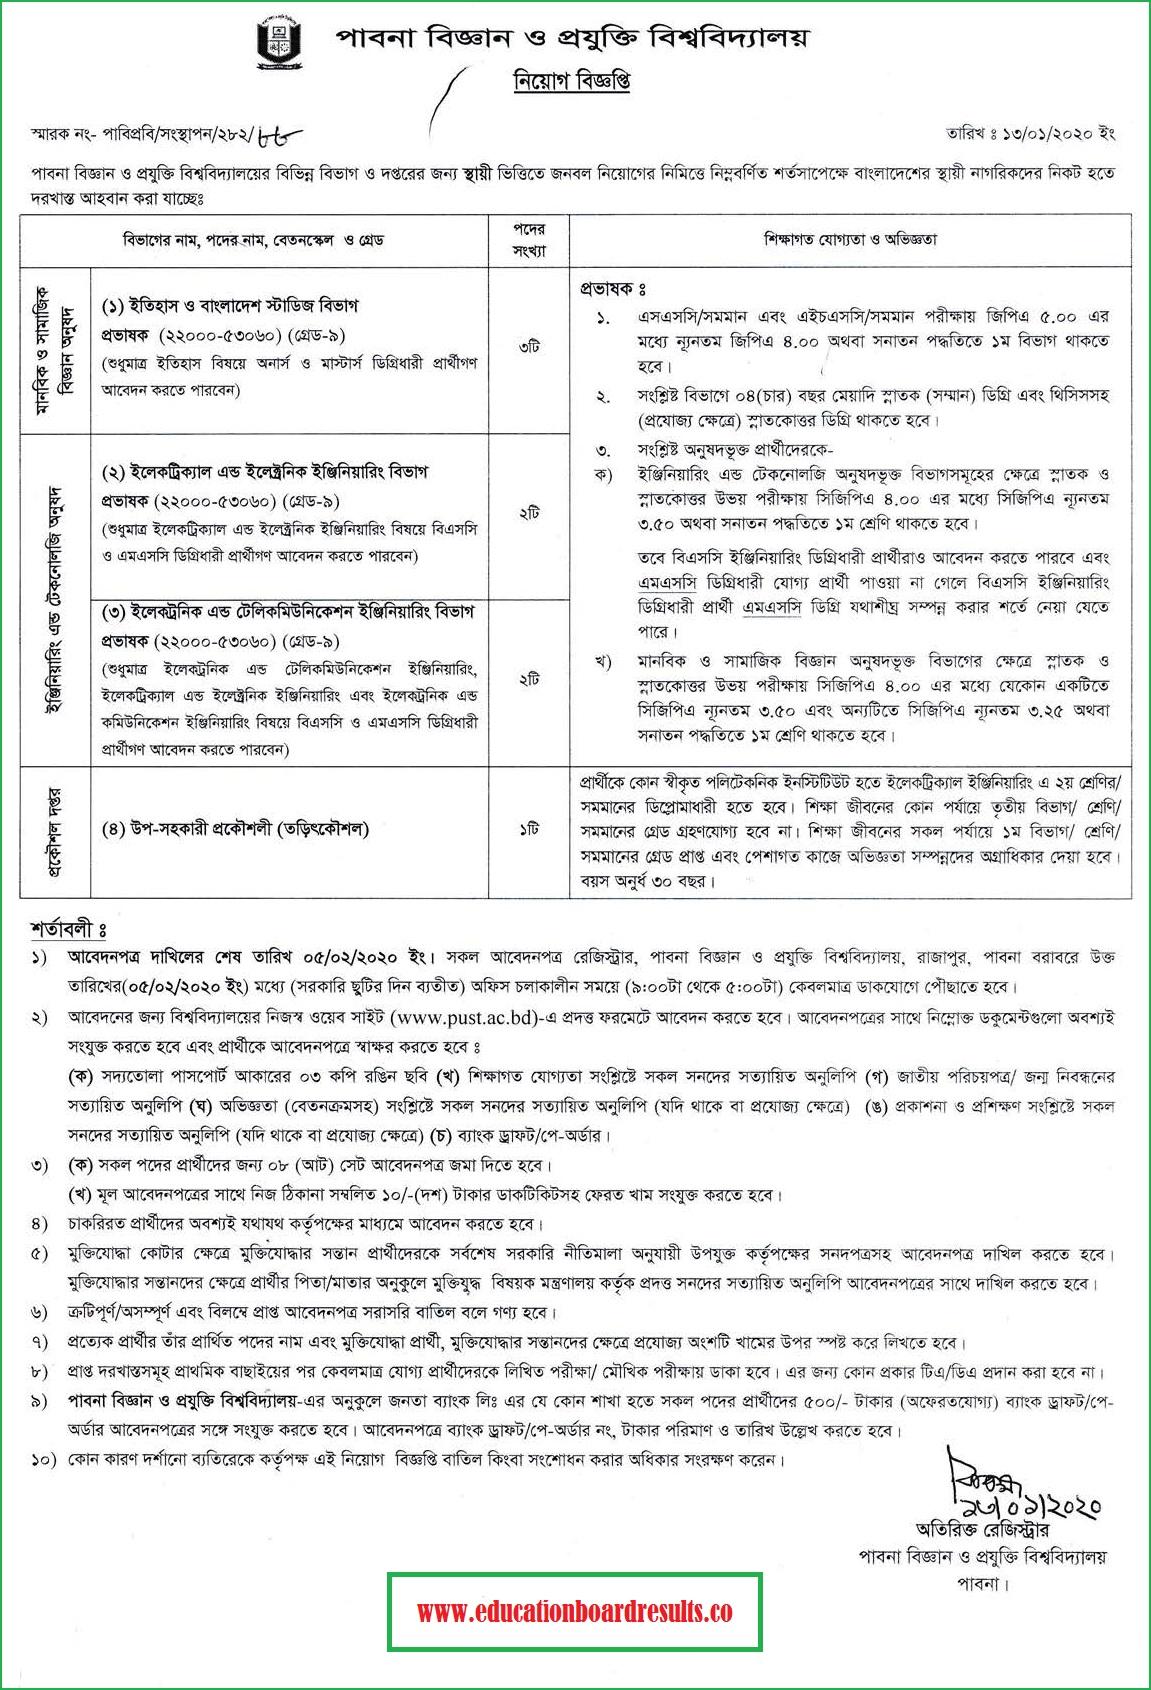 Pabna University of Science and Technology Job Circular 2020